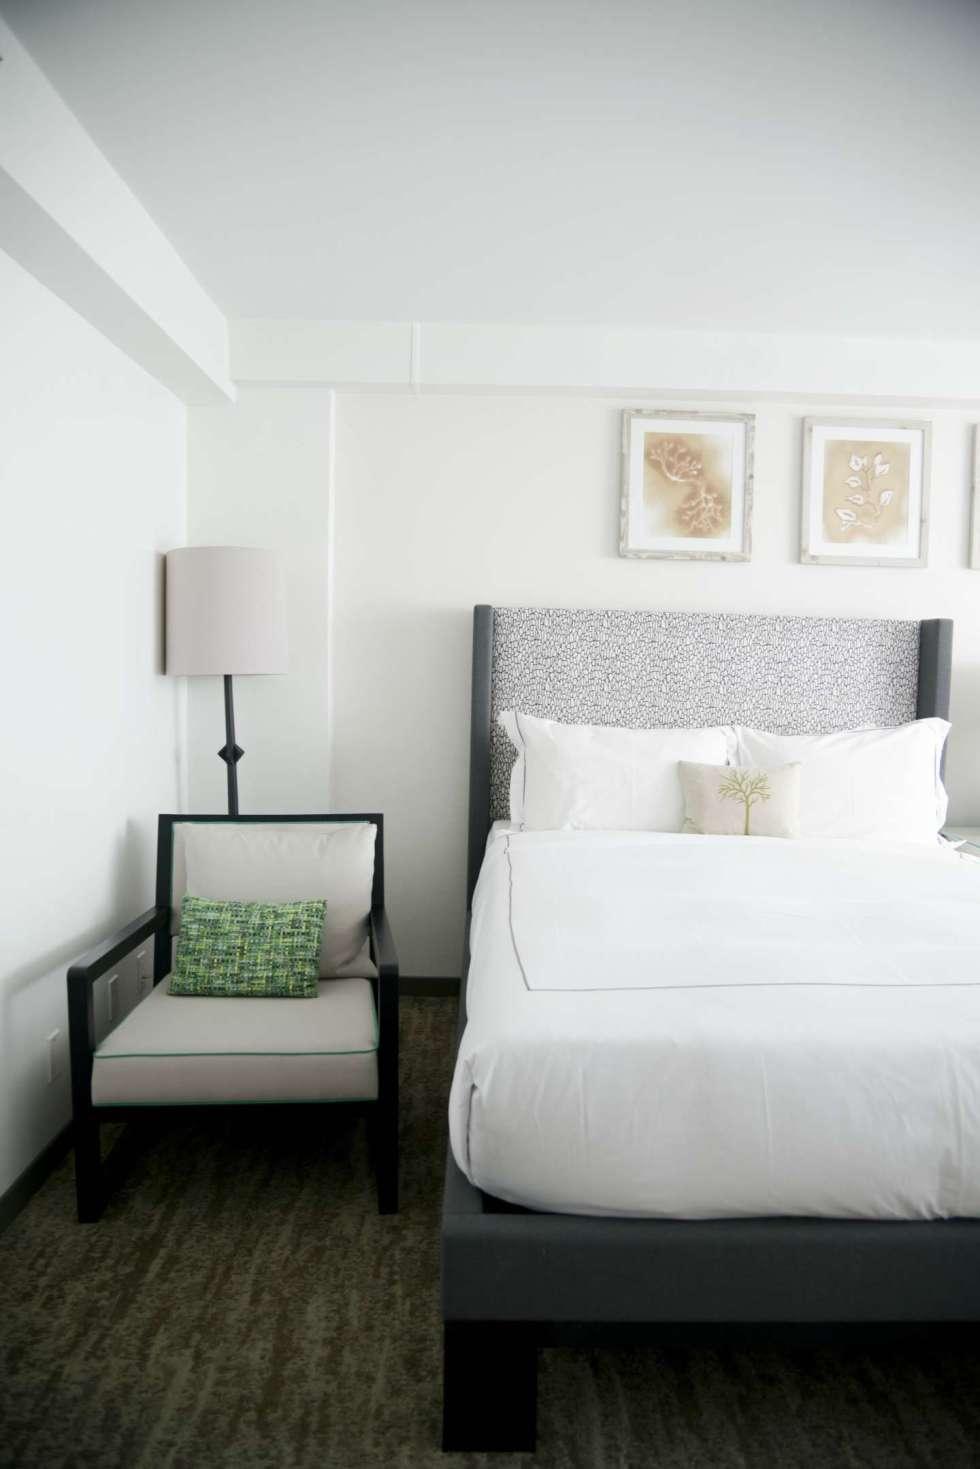 Kimpton Glover Park Hotel & Casolare in D.C. - I'm Fixin' To - @mbg0112